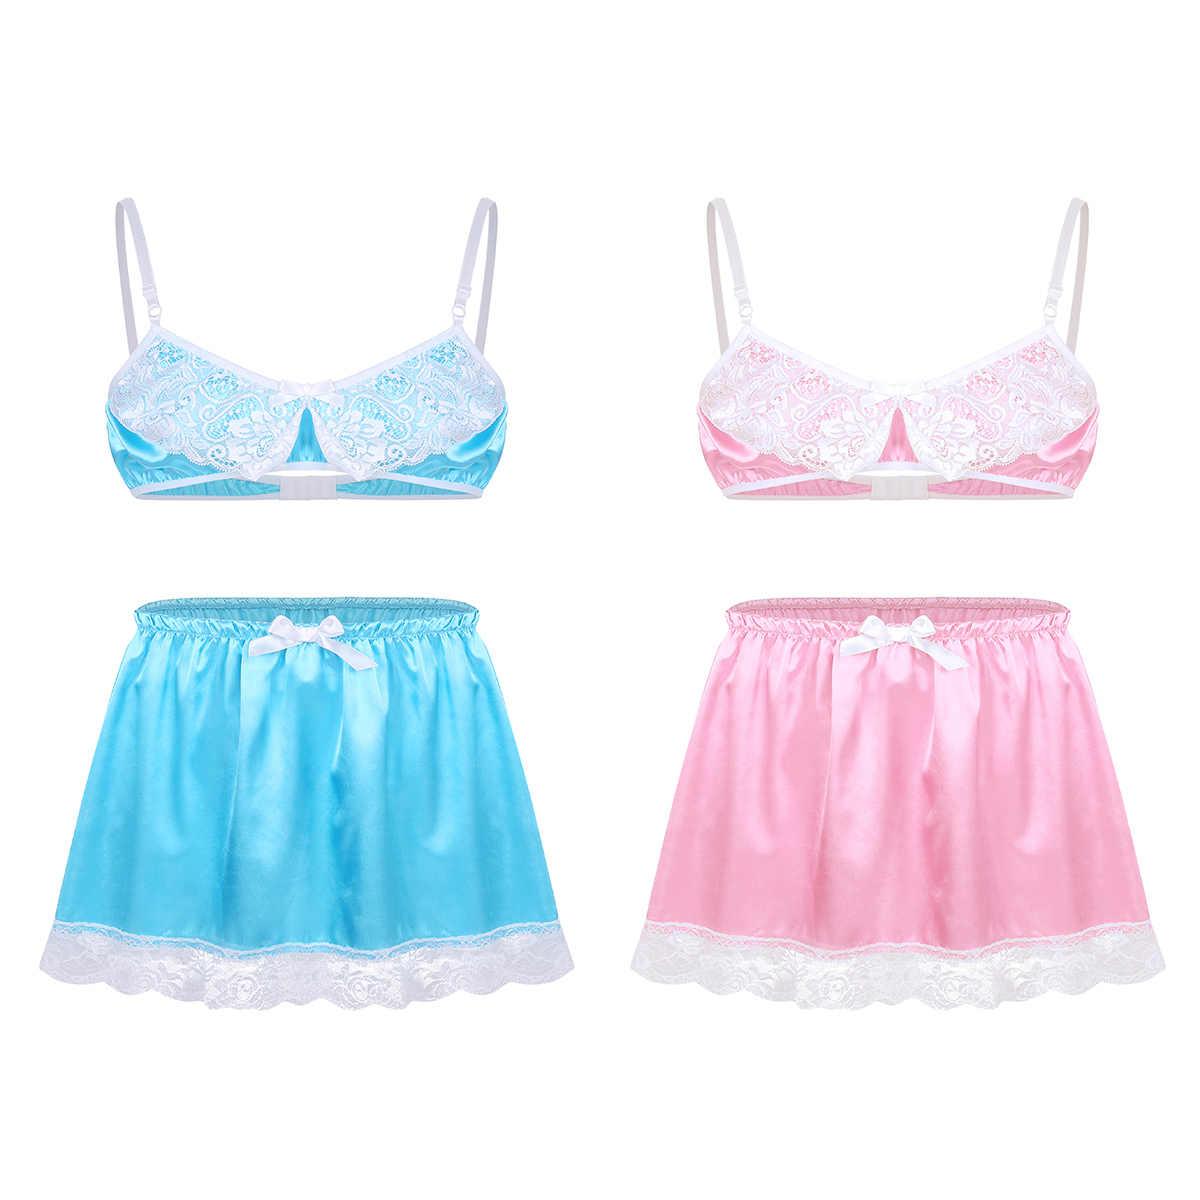 2Pcs Gay Mens Smooth Satin Lace Sissy Lingerie Set Exotische kleding Sexy Lingerie Femme Babydoll Kant Kostuums Beha Top met Rok